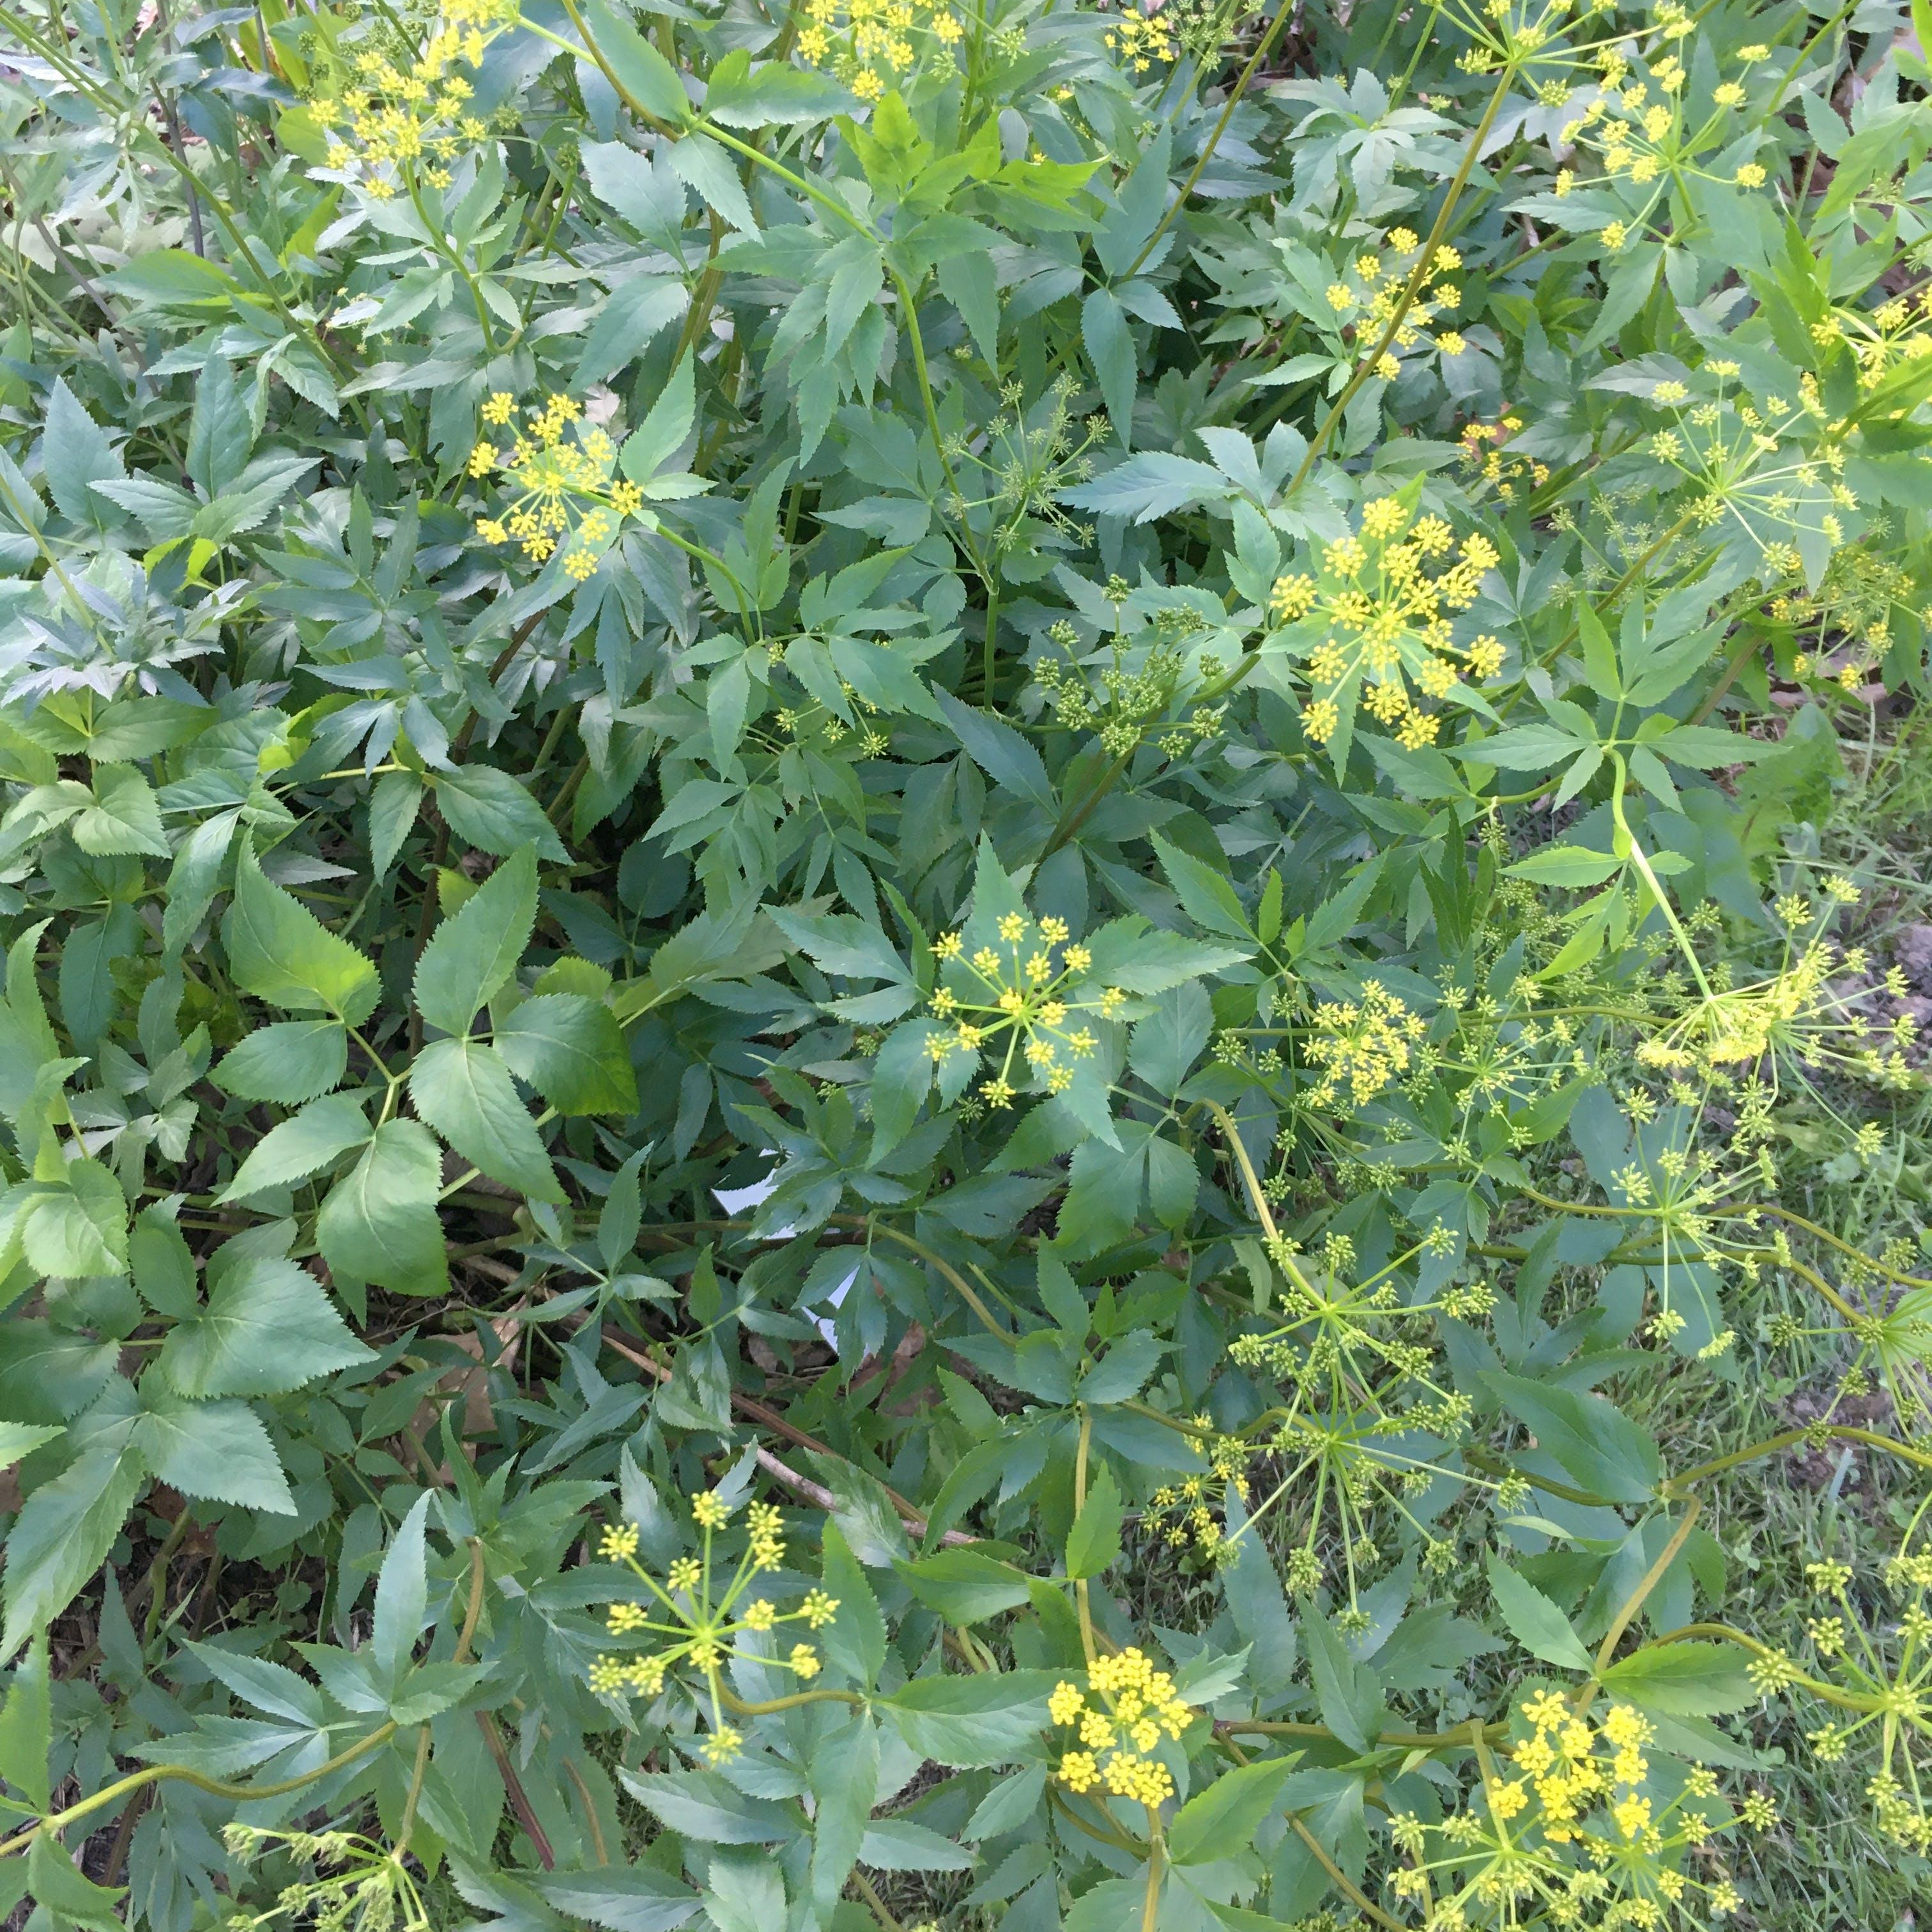 MAY in the pollinator garden. Zizia aurea (Golden Alexanders) is a host plant for Black Swallowtail caterpillars.